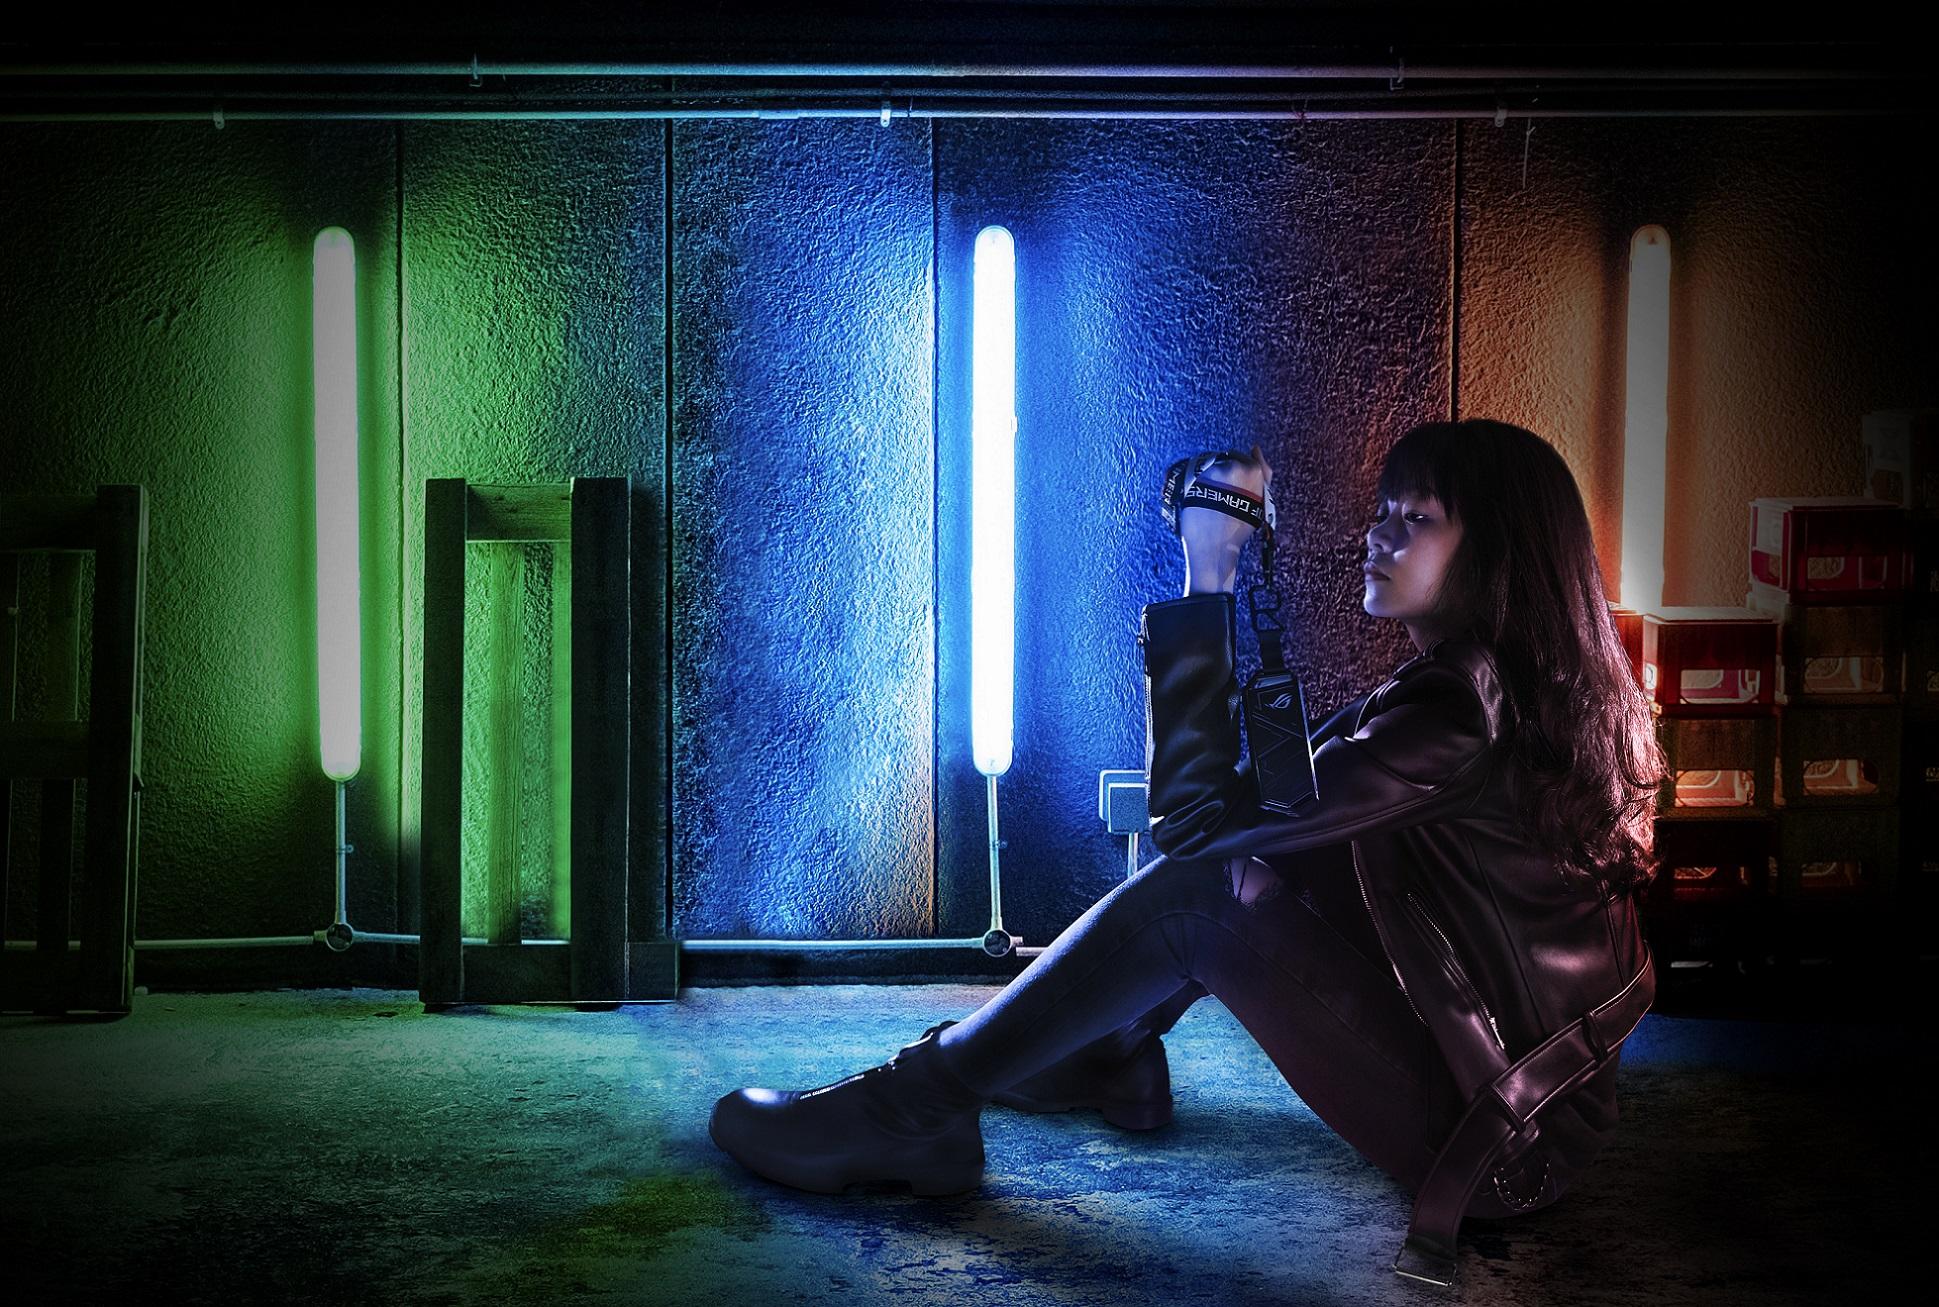 ROG Strix Arion SSD 固態硬碟外接盒內建的ASUS Aura Sync燈光技術,展示RGB酷炫燈效,盡顯個人電競風格。